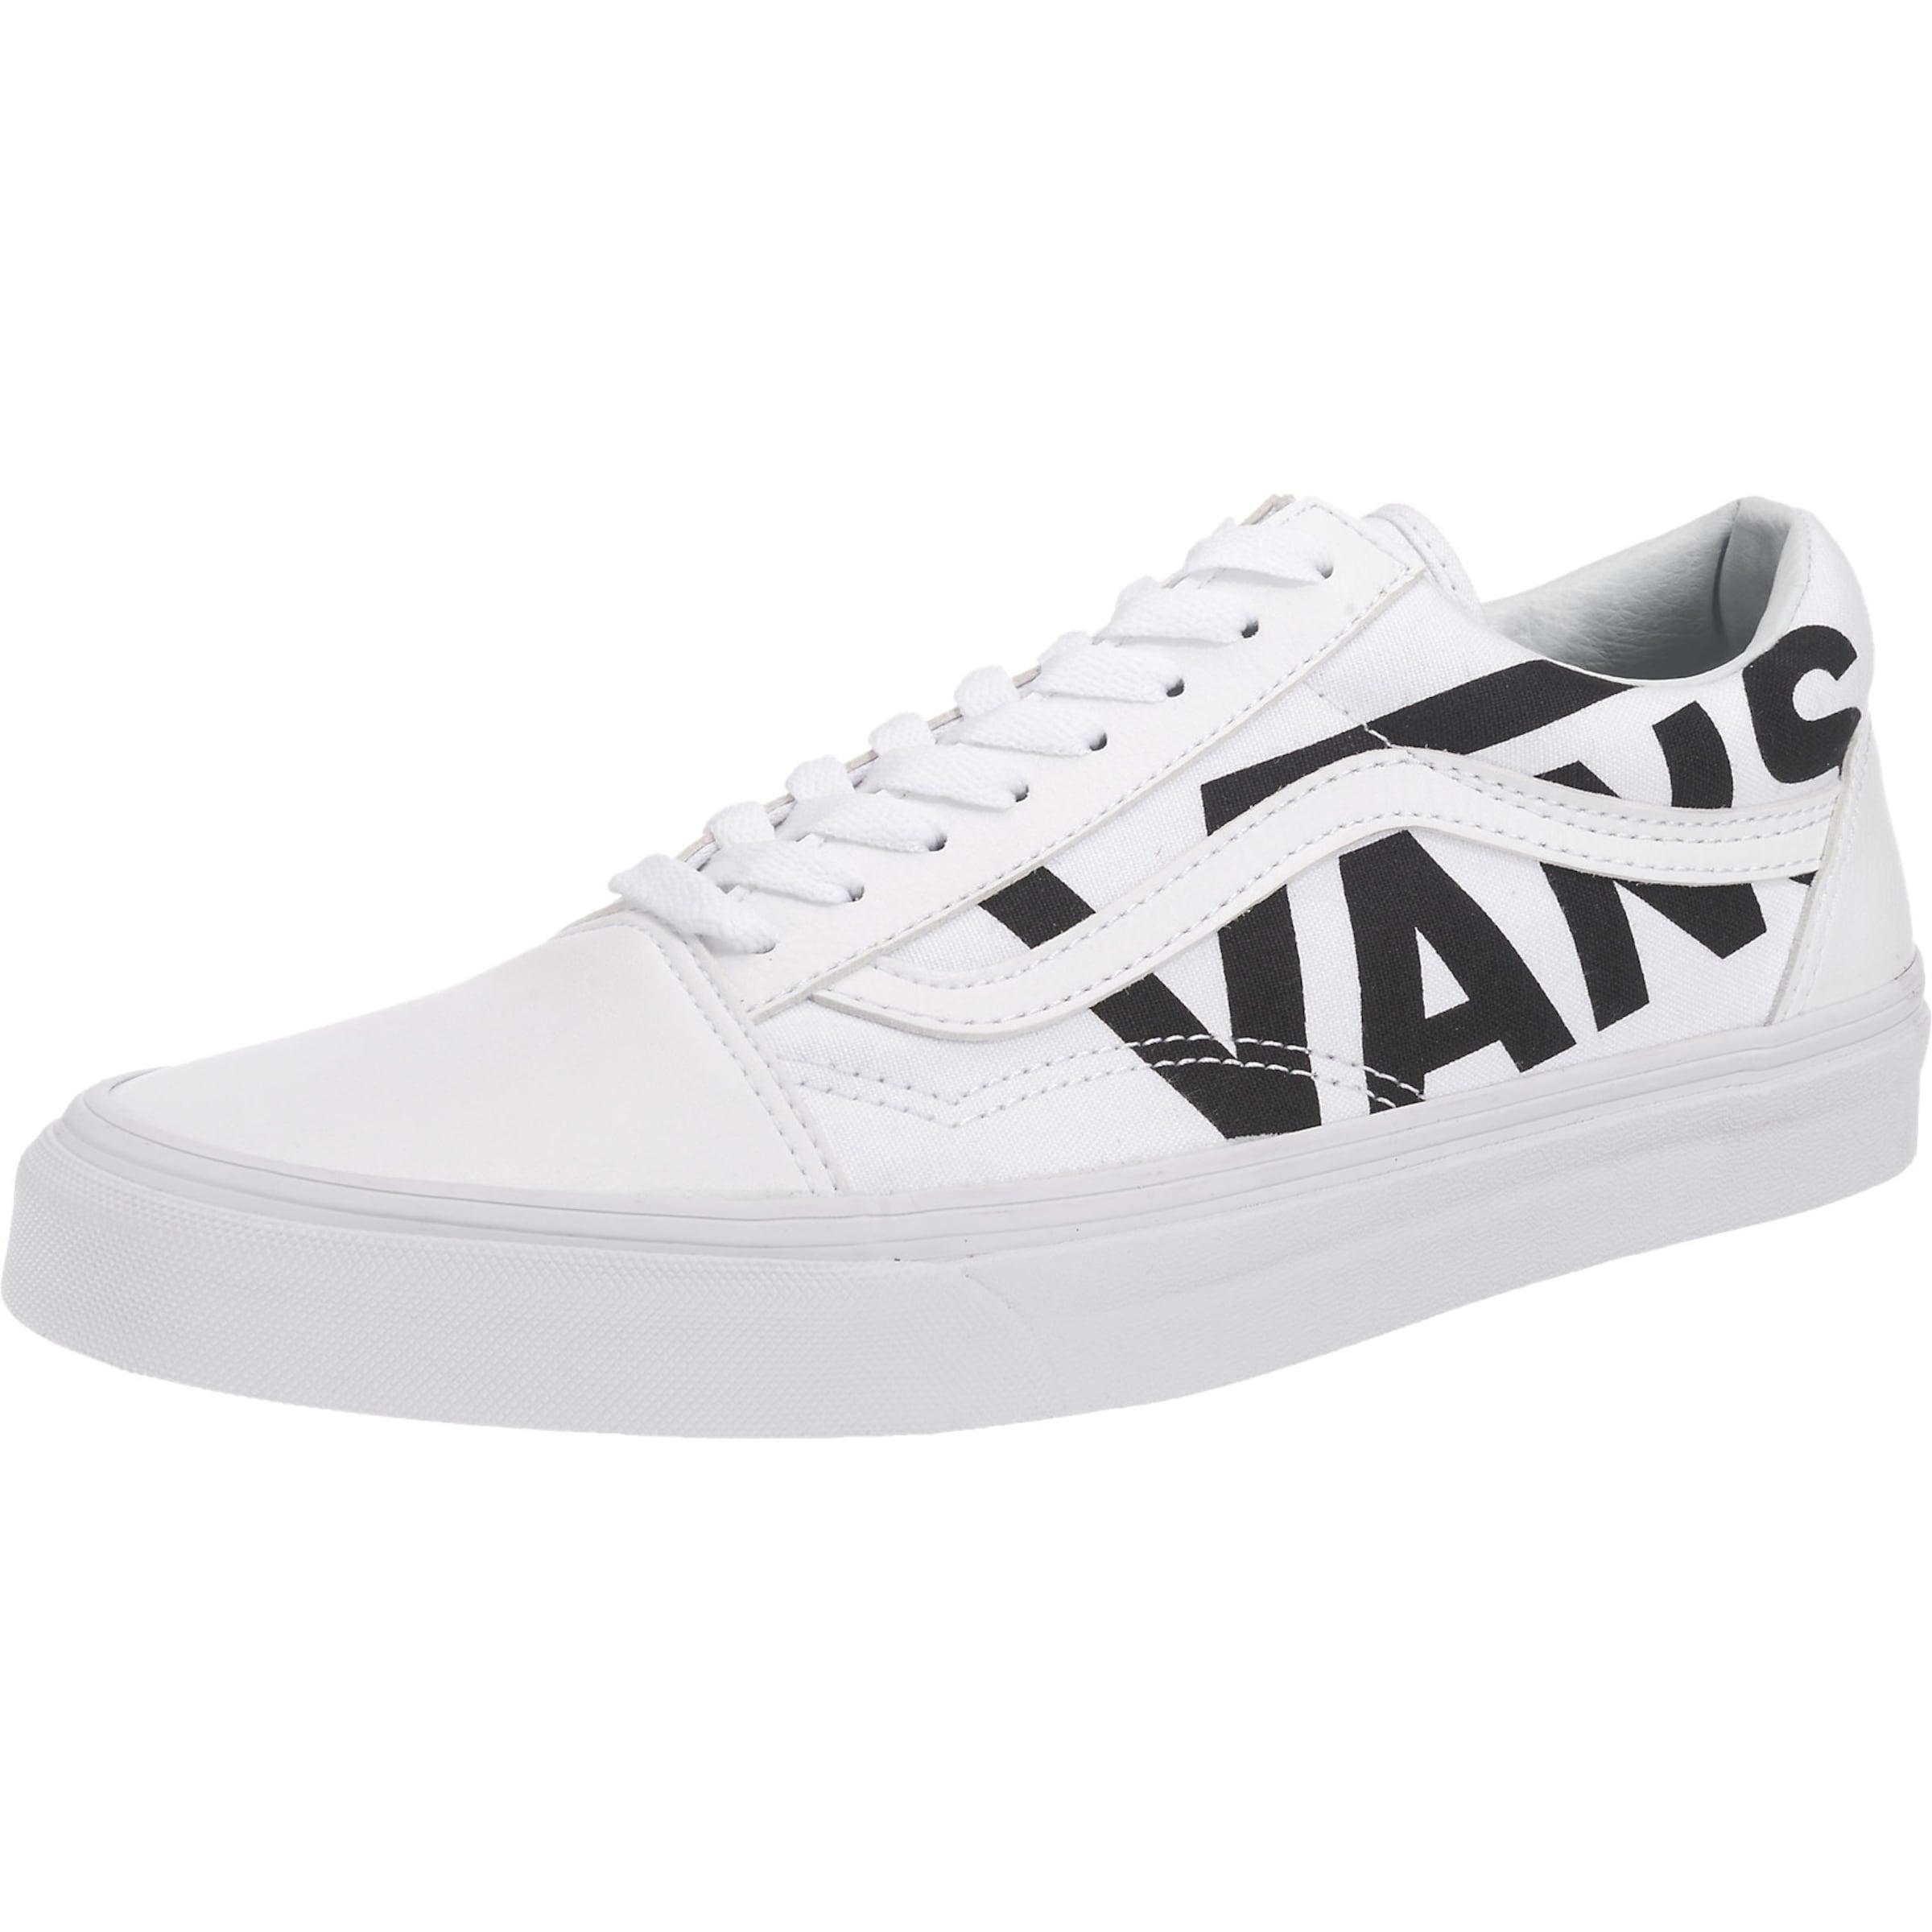 VANS Old Skool Sneakers Verschleißfeste billige Schuhe